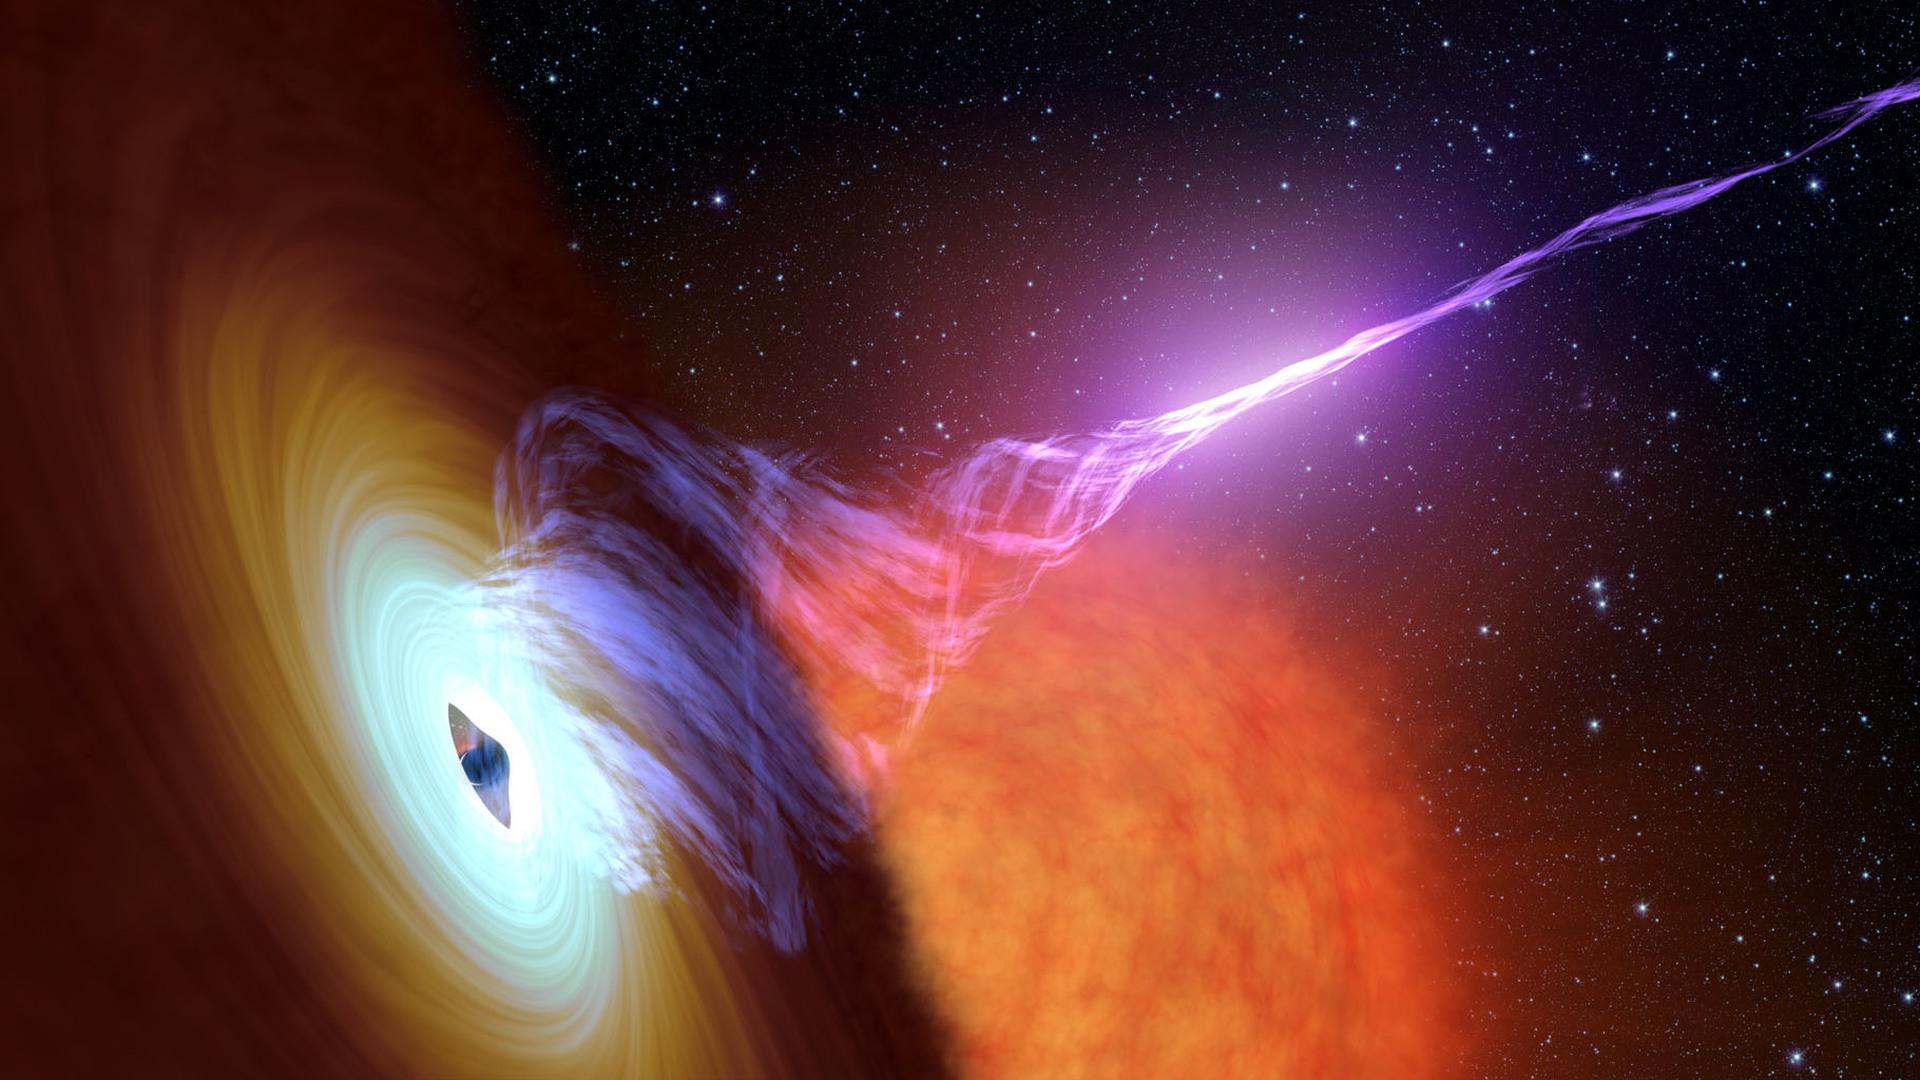 Репортаж из черной дыры